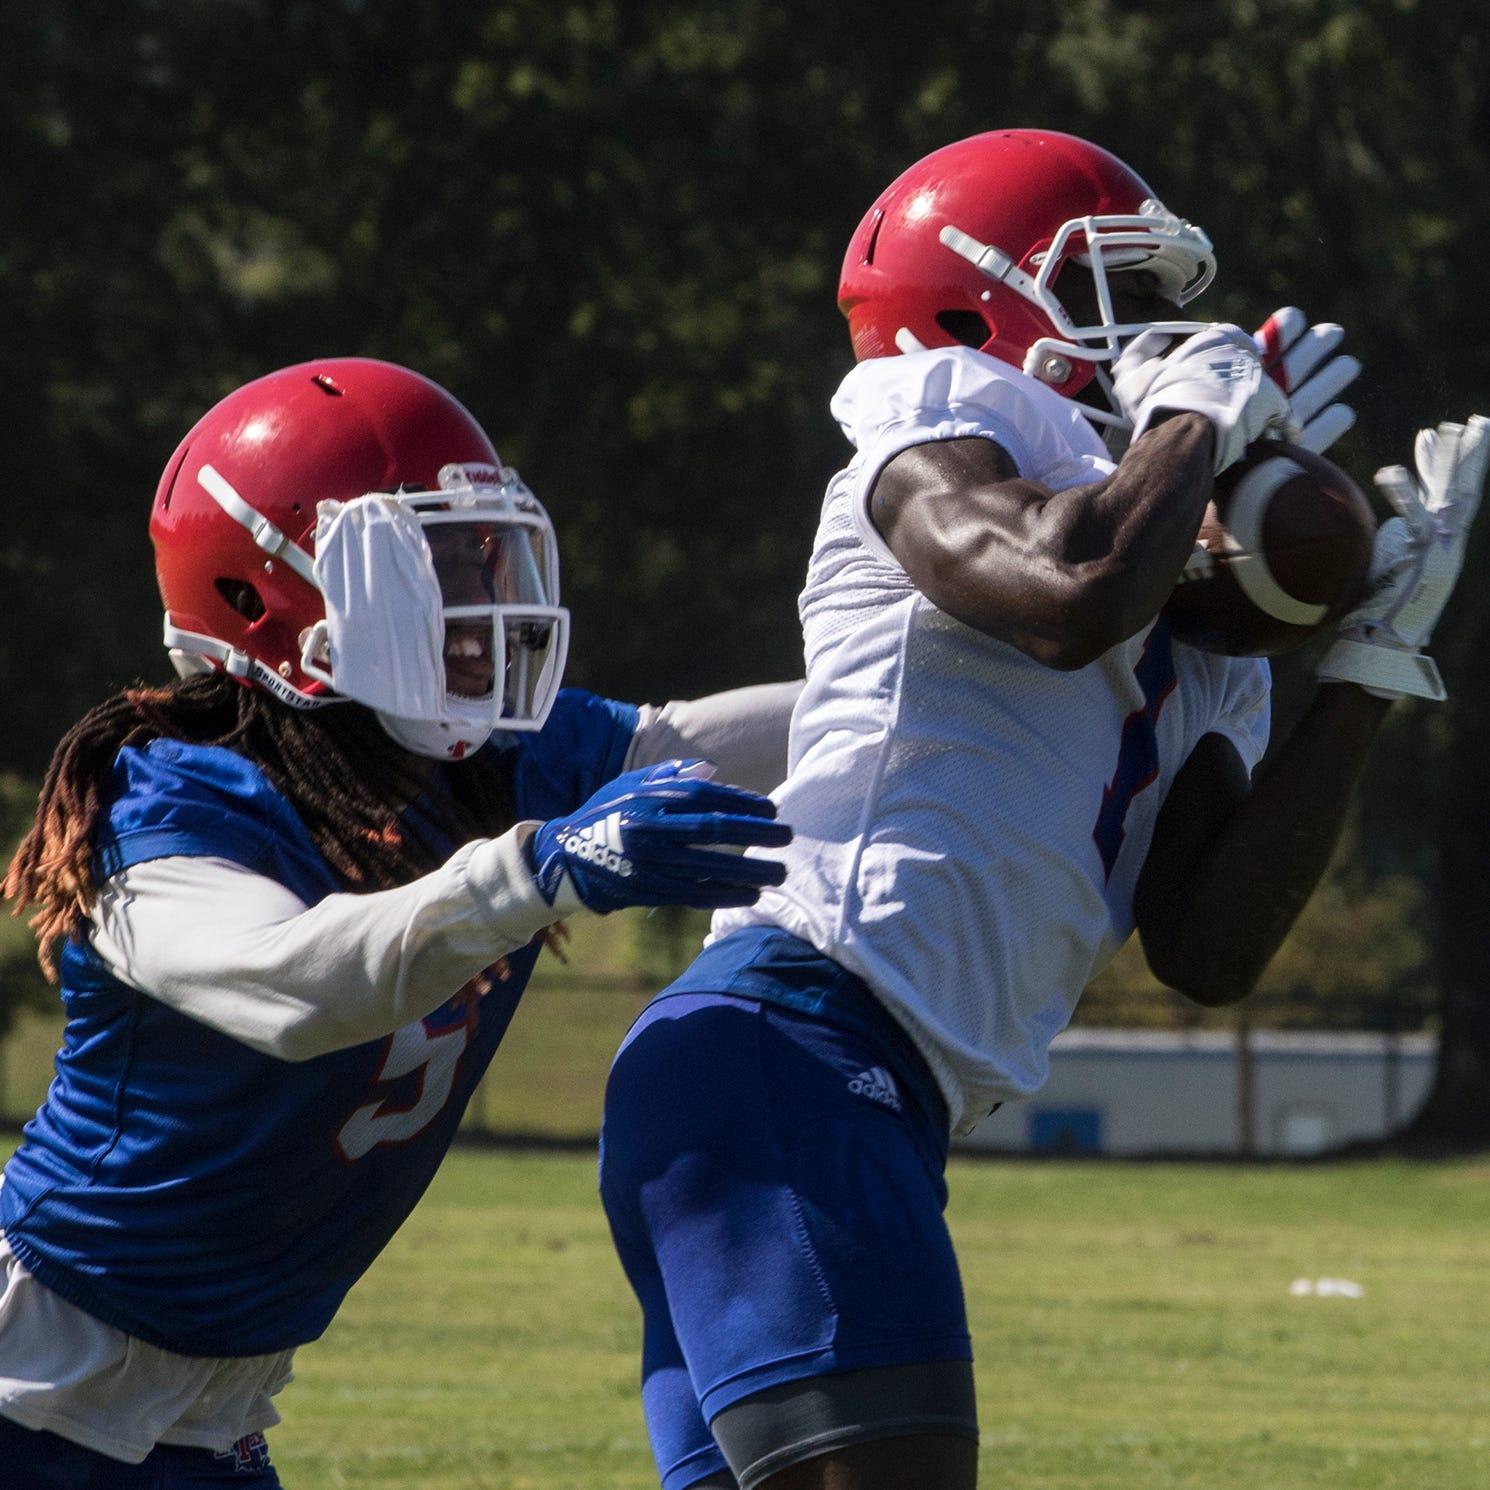 Louisiana Tech looks for its next impact freshman